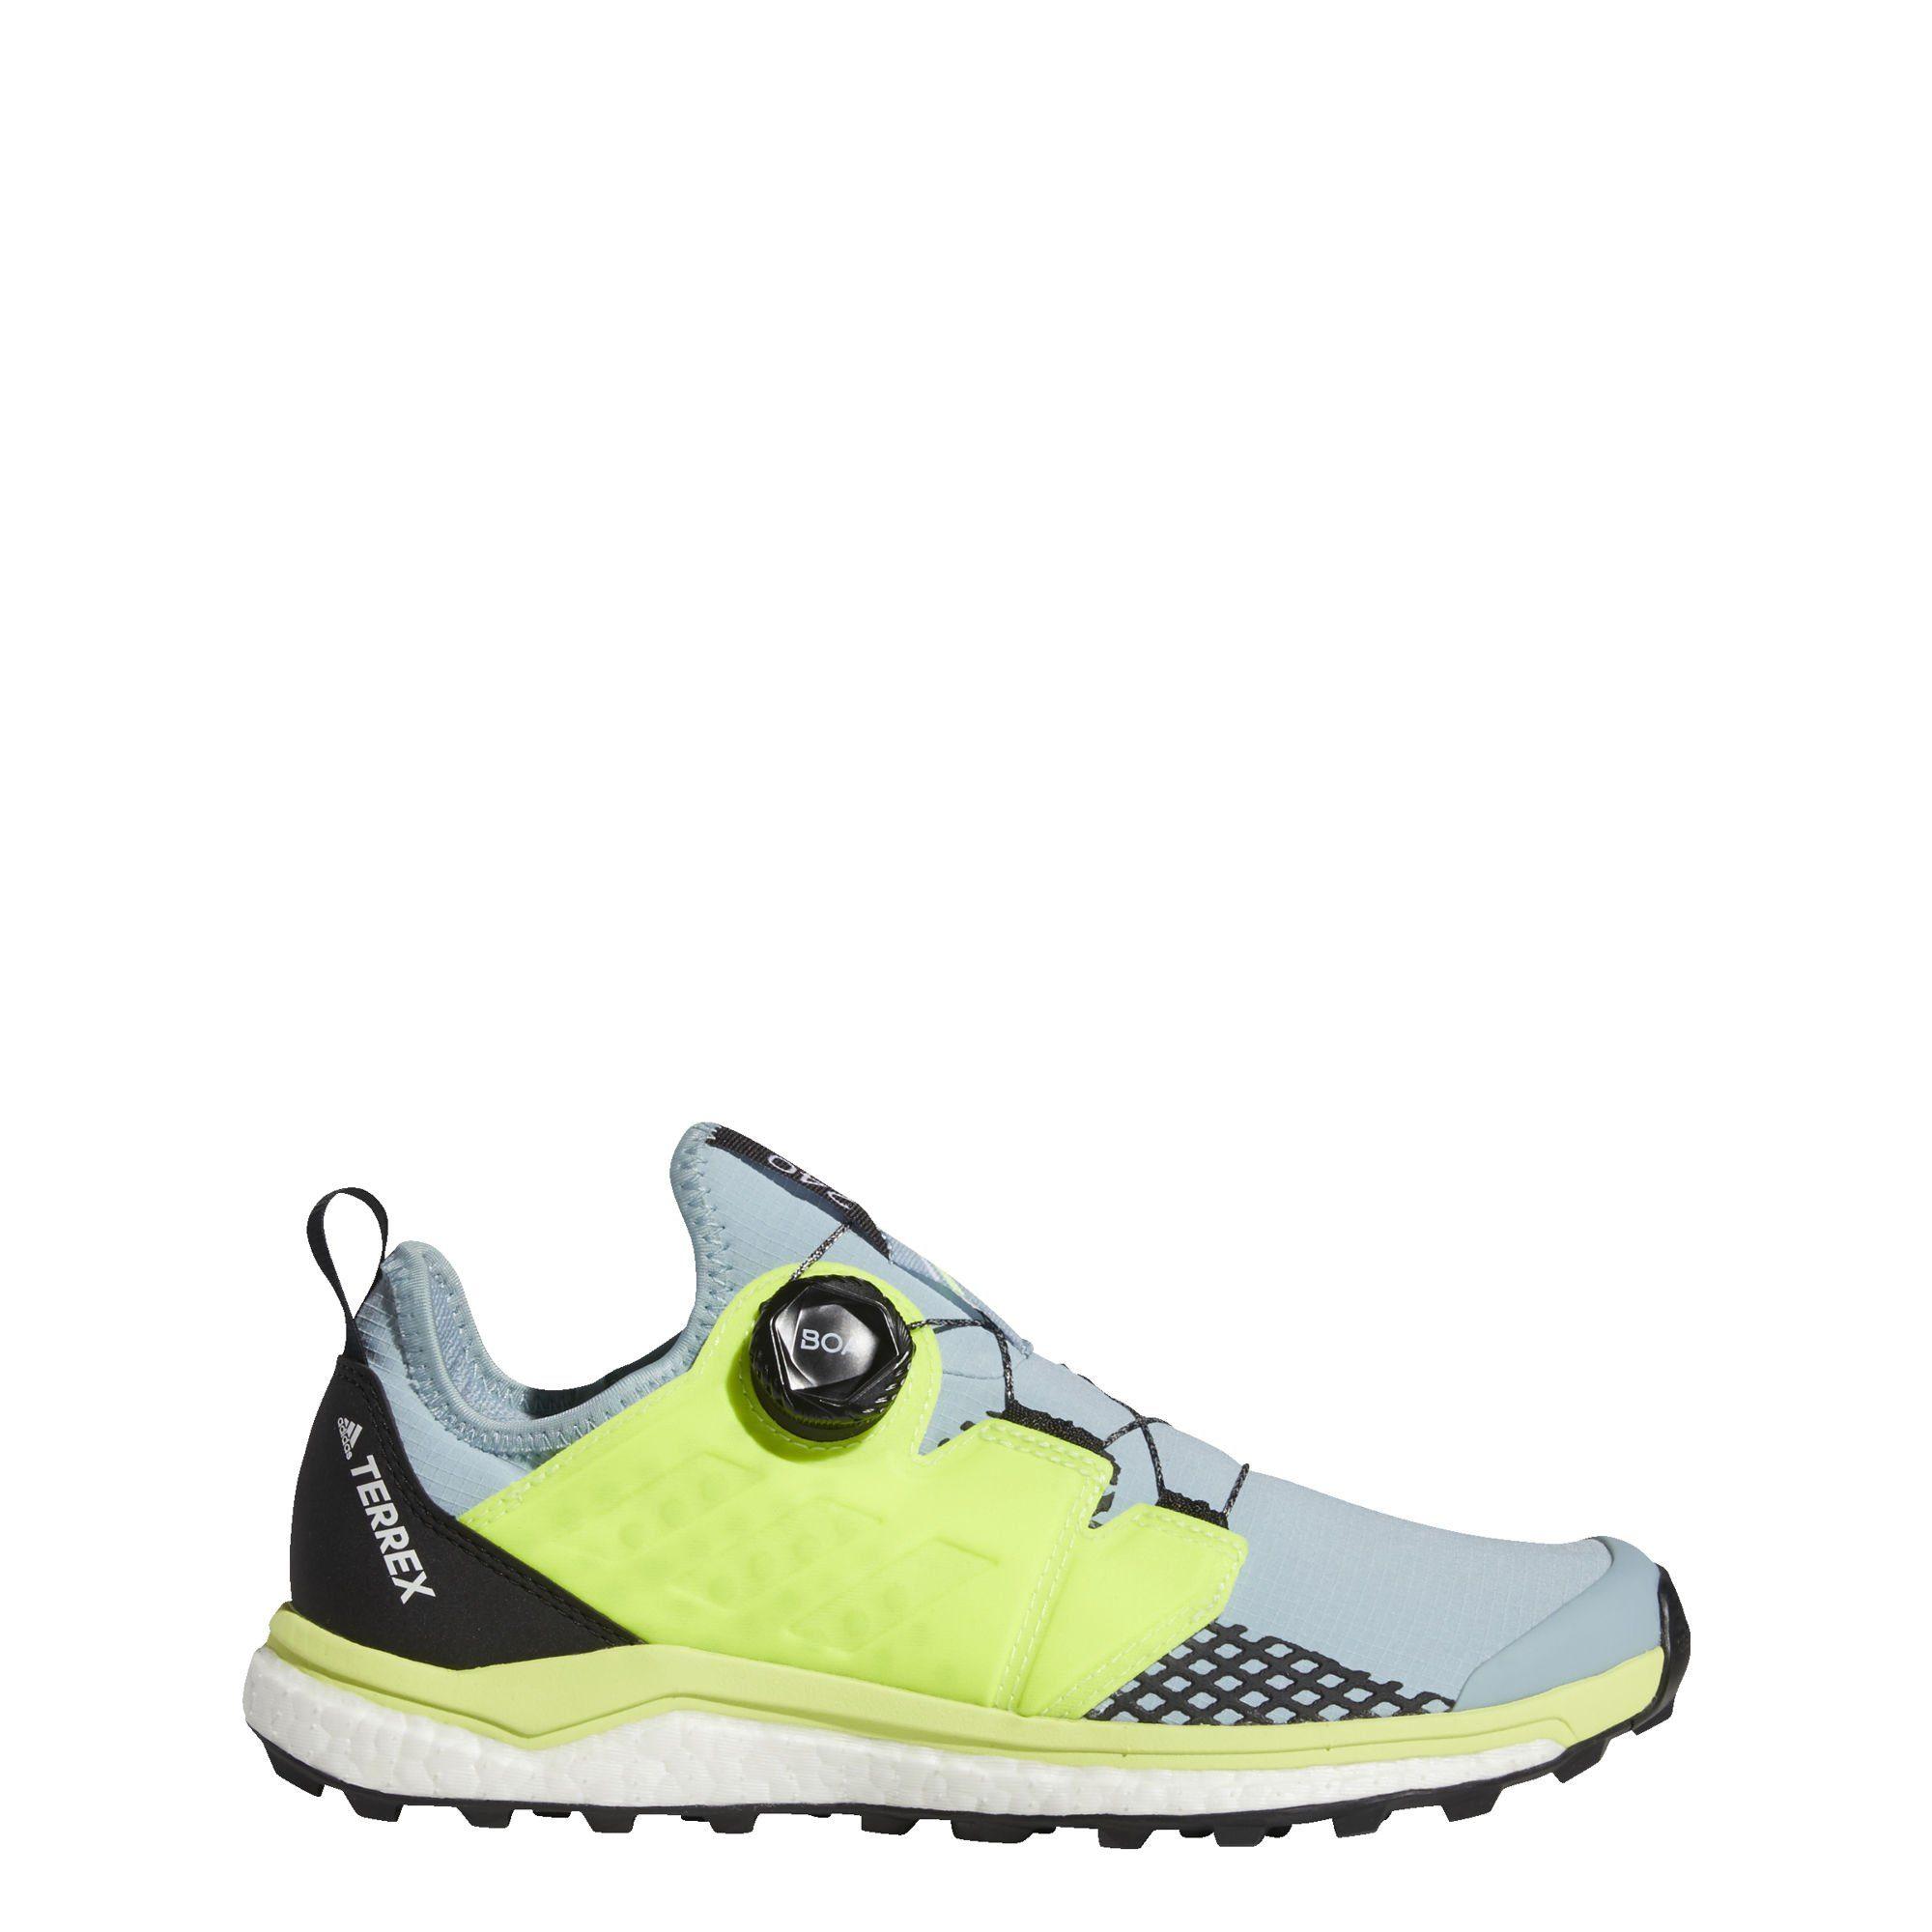 adidas Performance »TERREX Skychaser GTX Schuh« Outdoorschuh Outdoorschuh online kaufen | OTTO